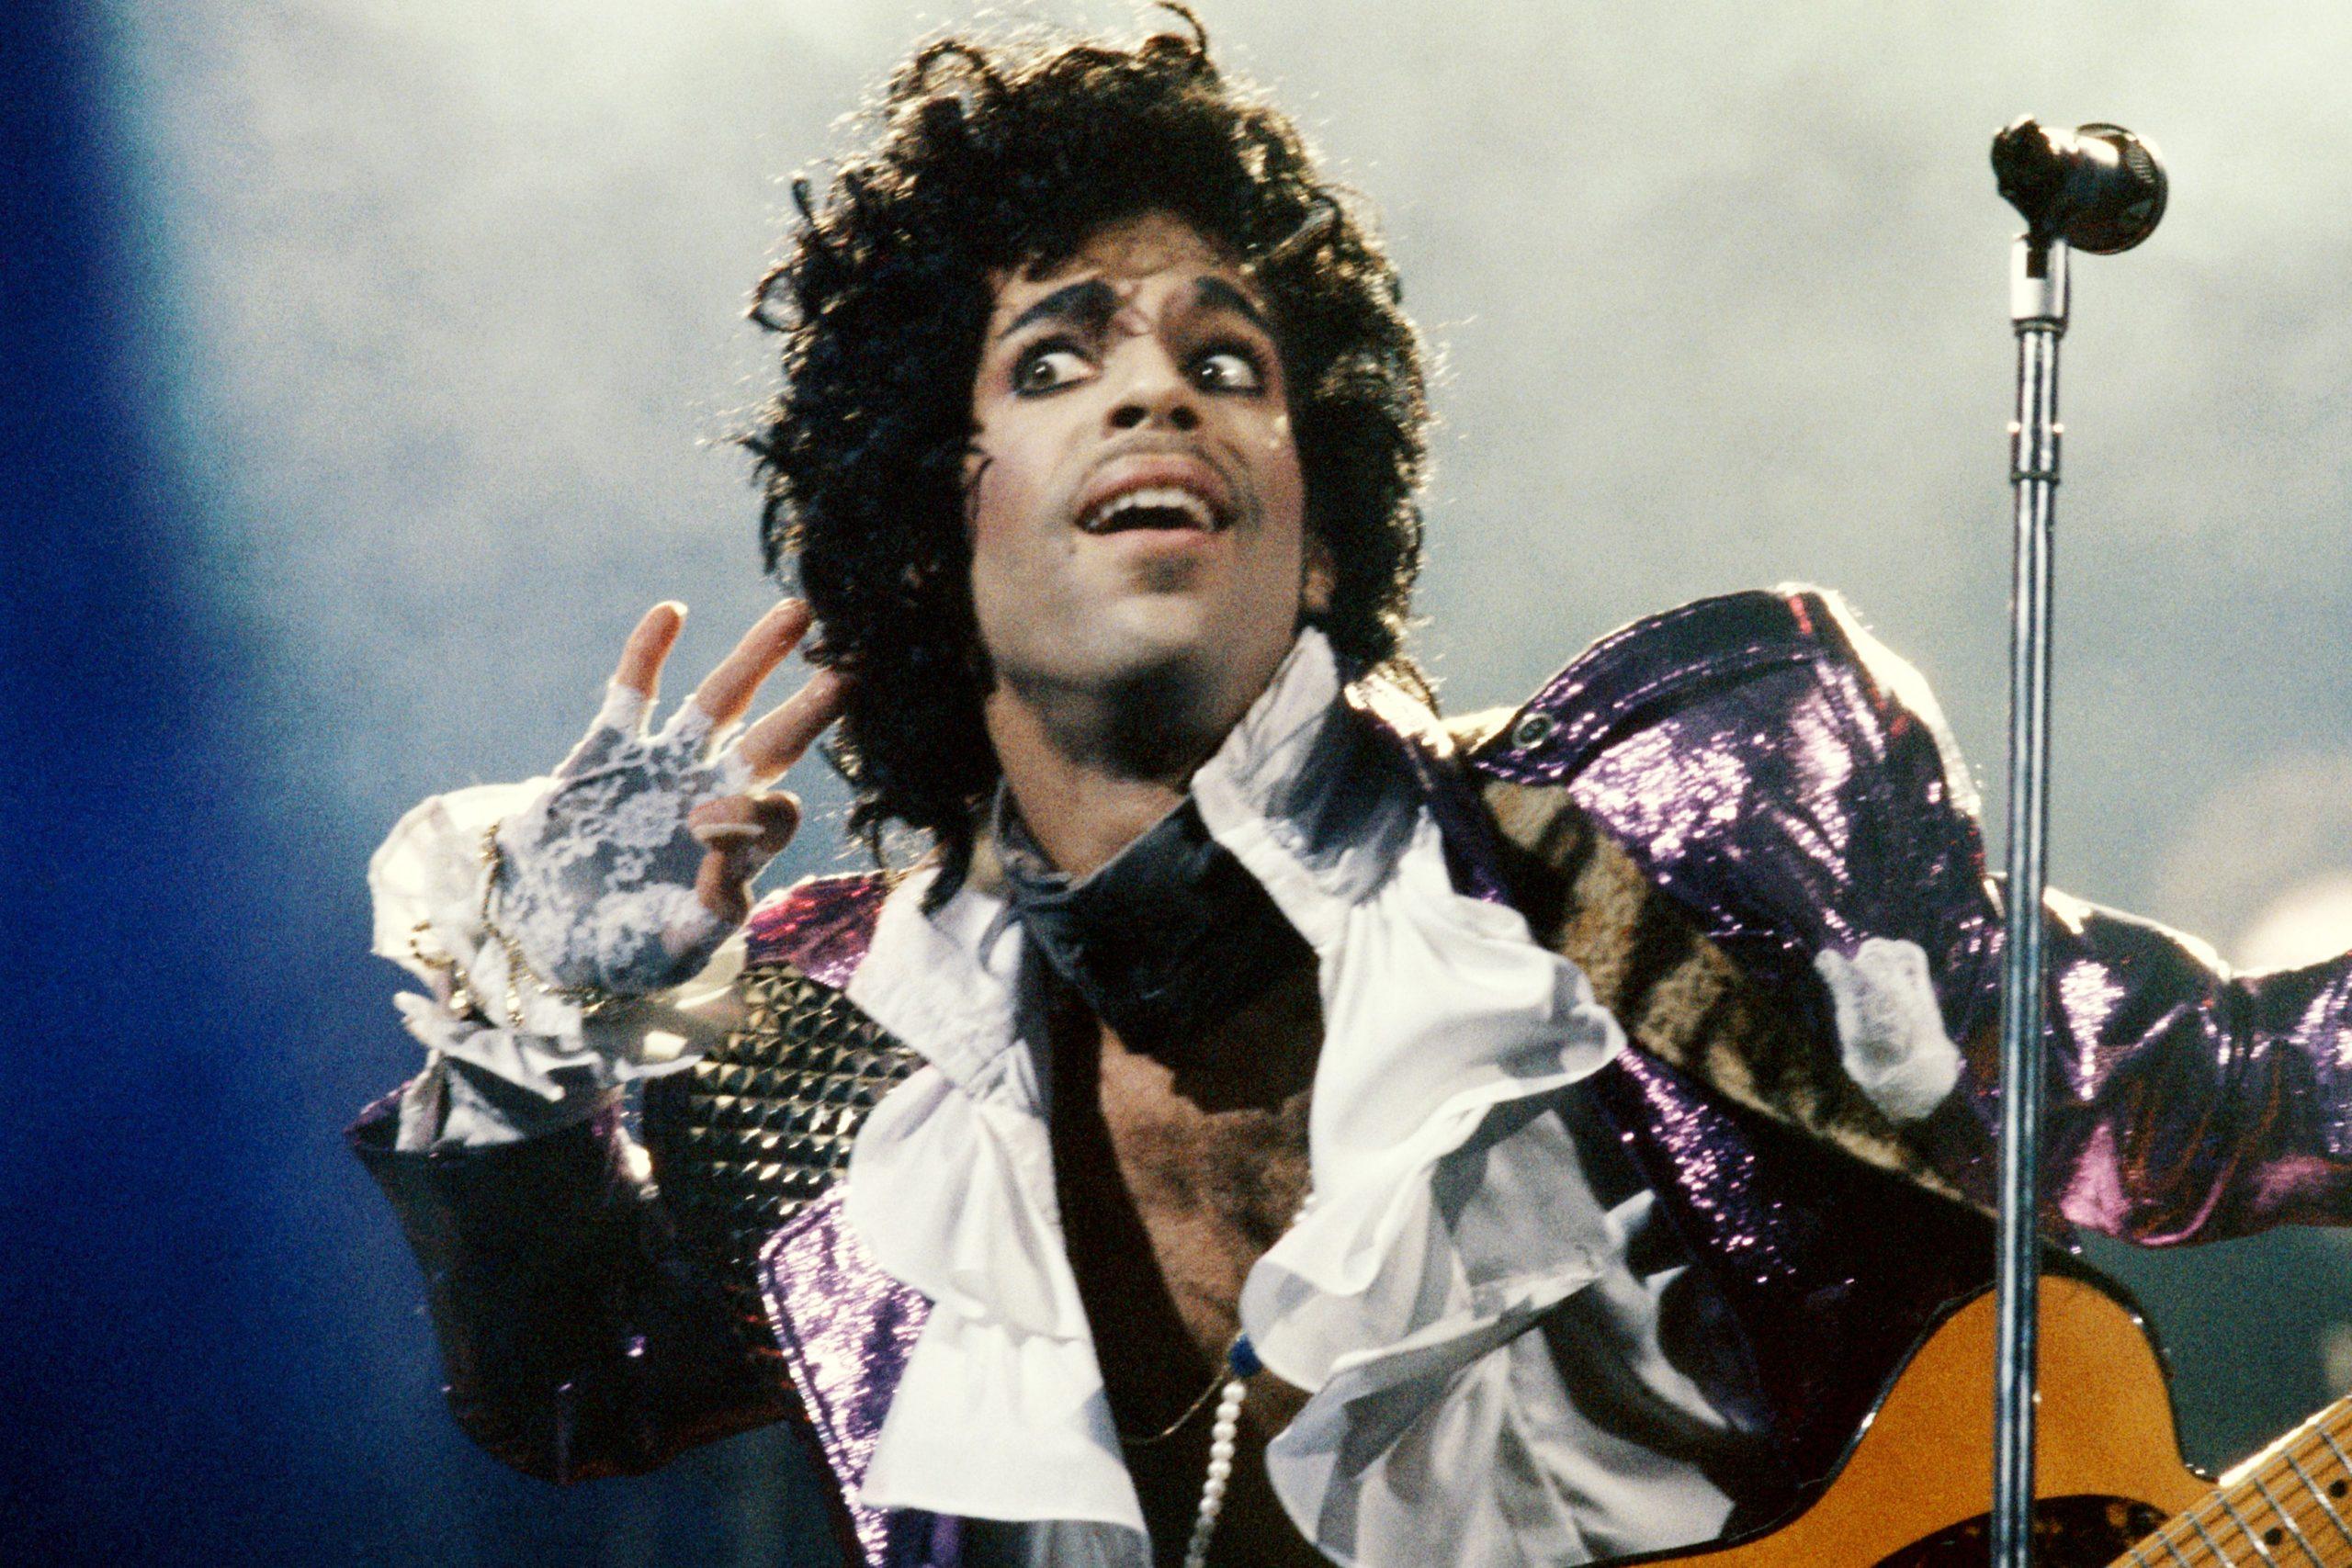 prince 1985 purple rain koncert scaled